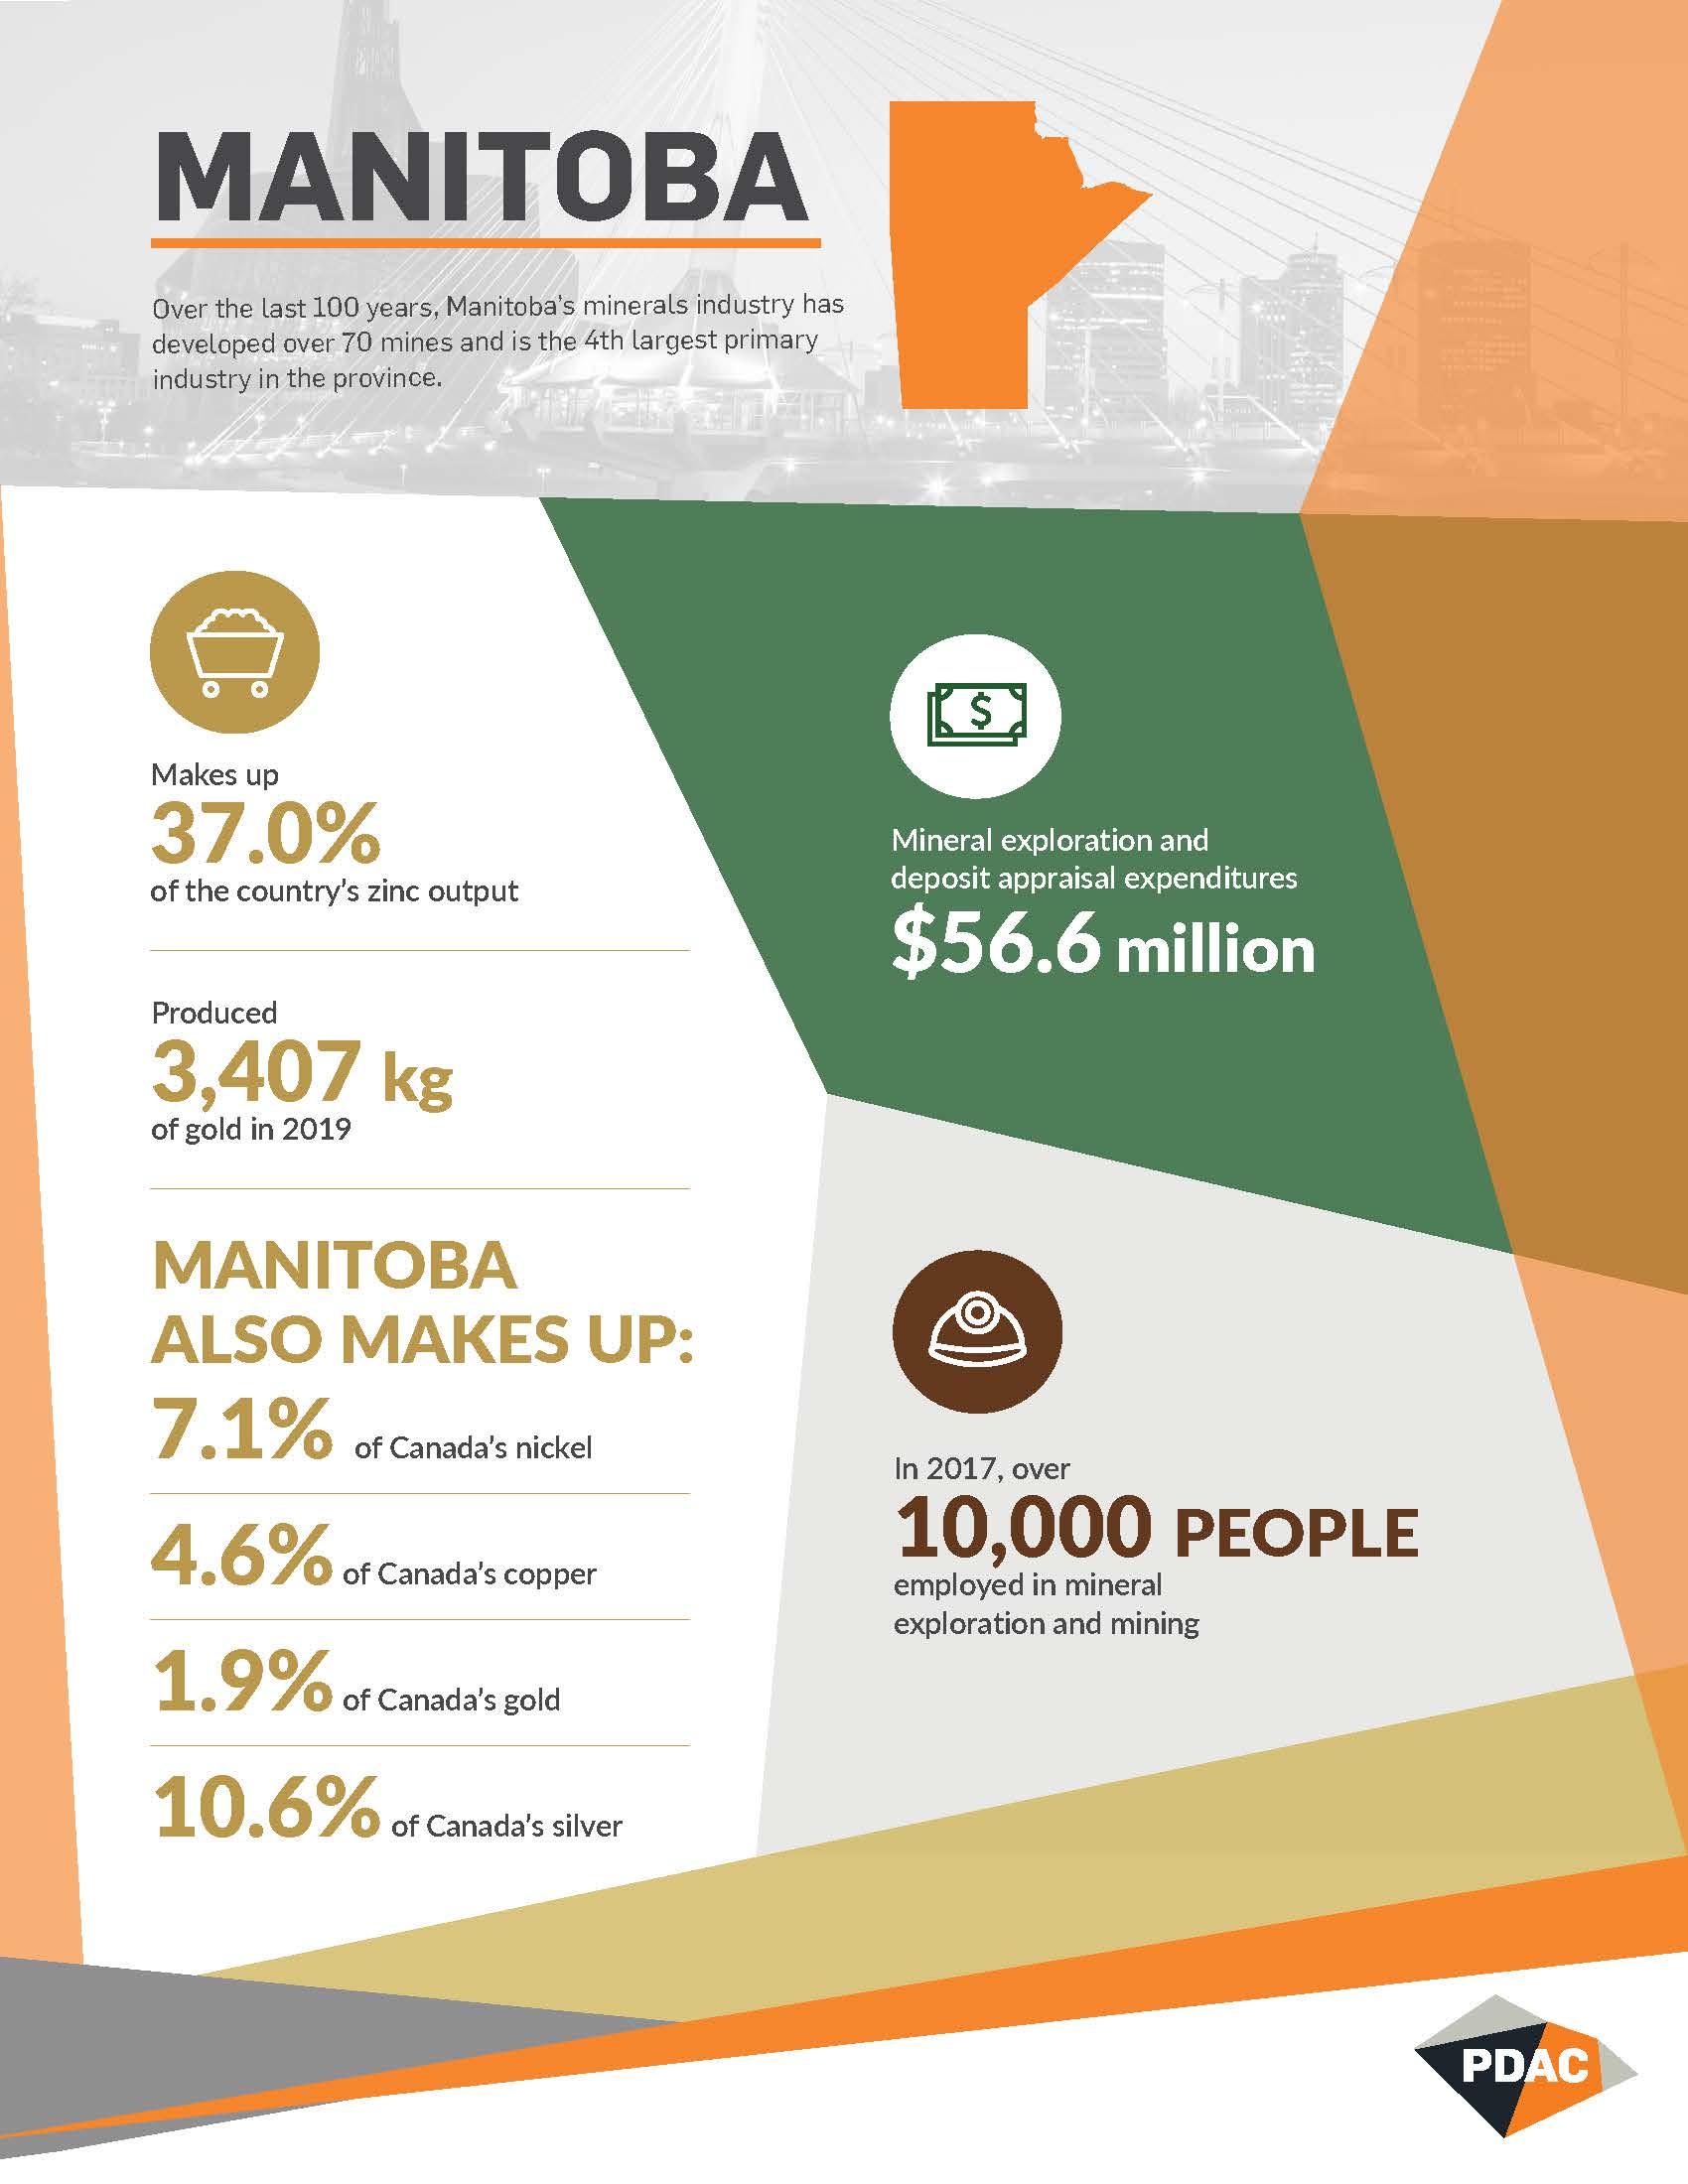 PDAC Manitoba